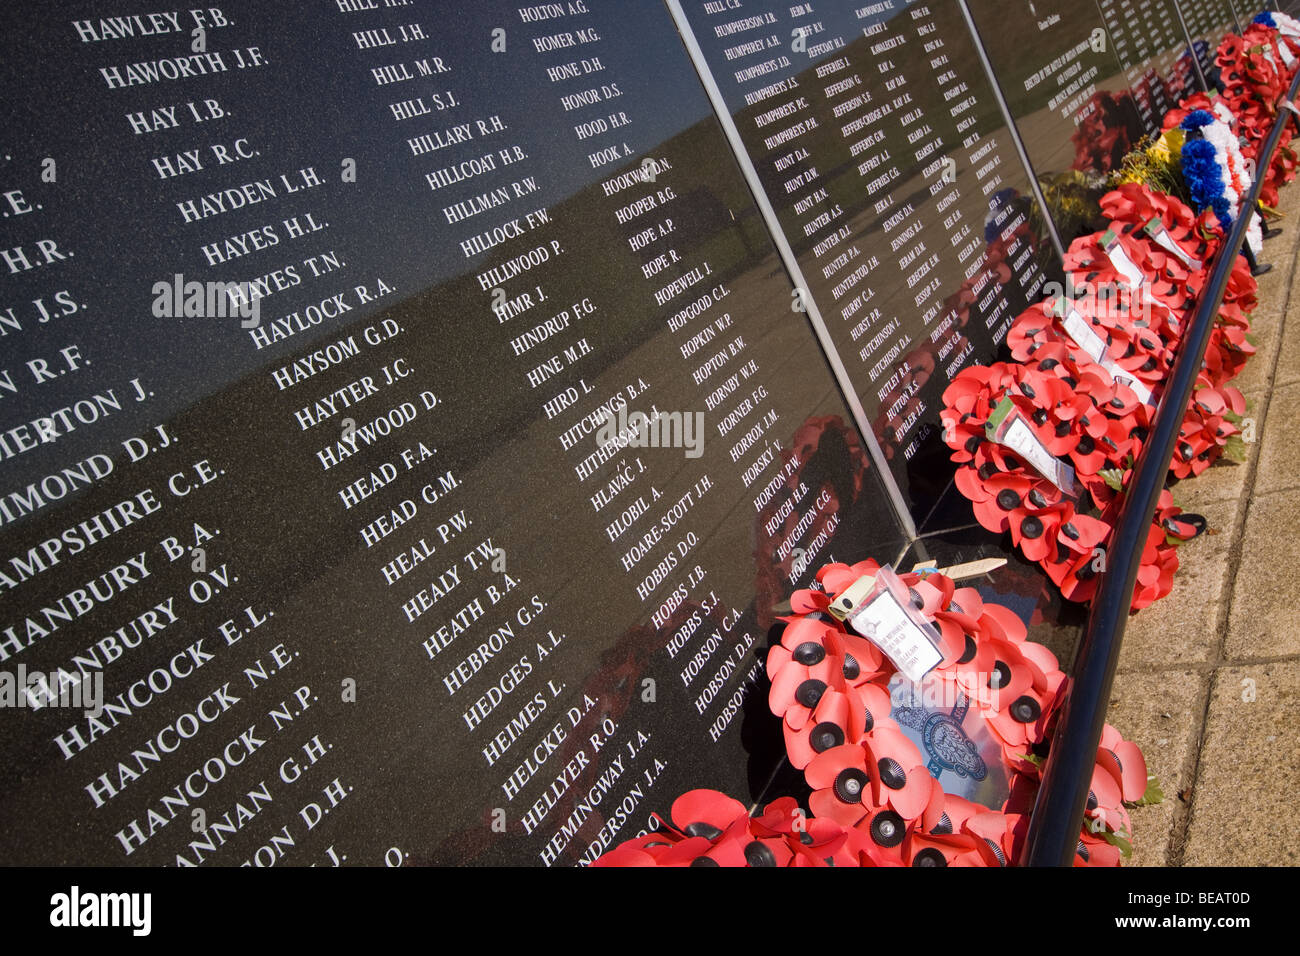 Battle of Britain Memorial at Capel-le-Ferne Kent - Stock Image